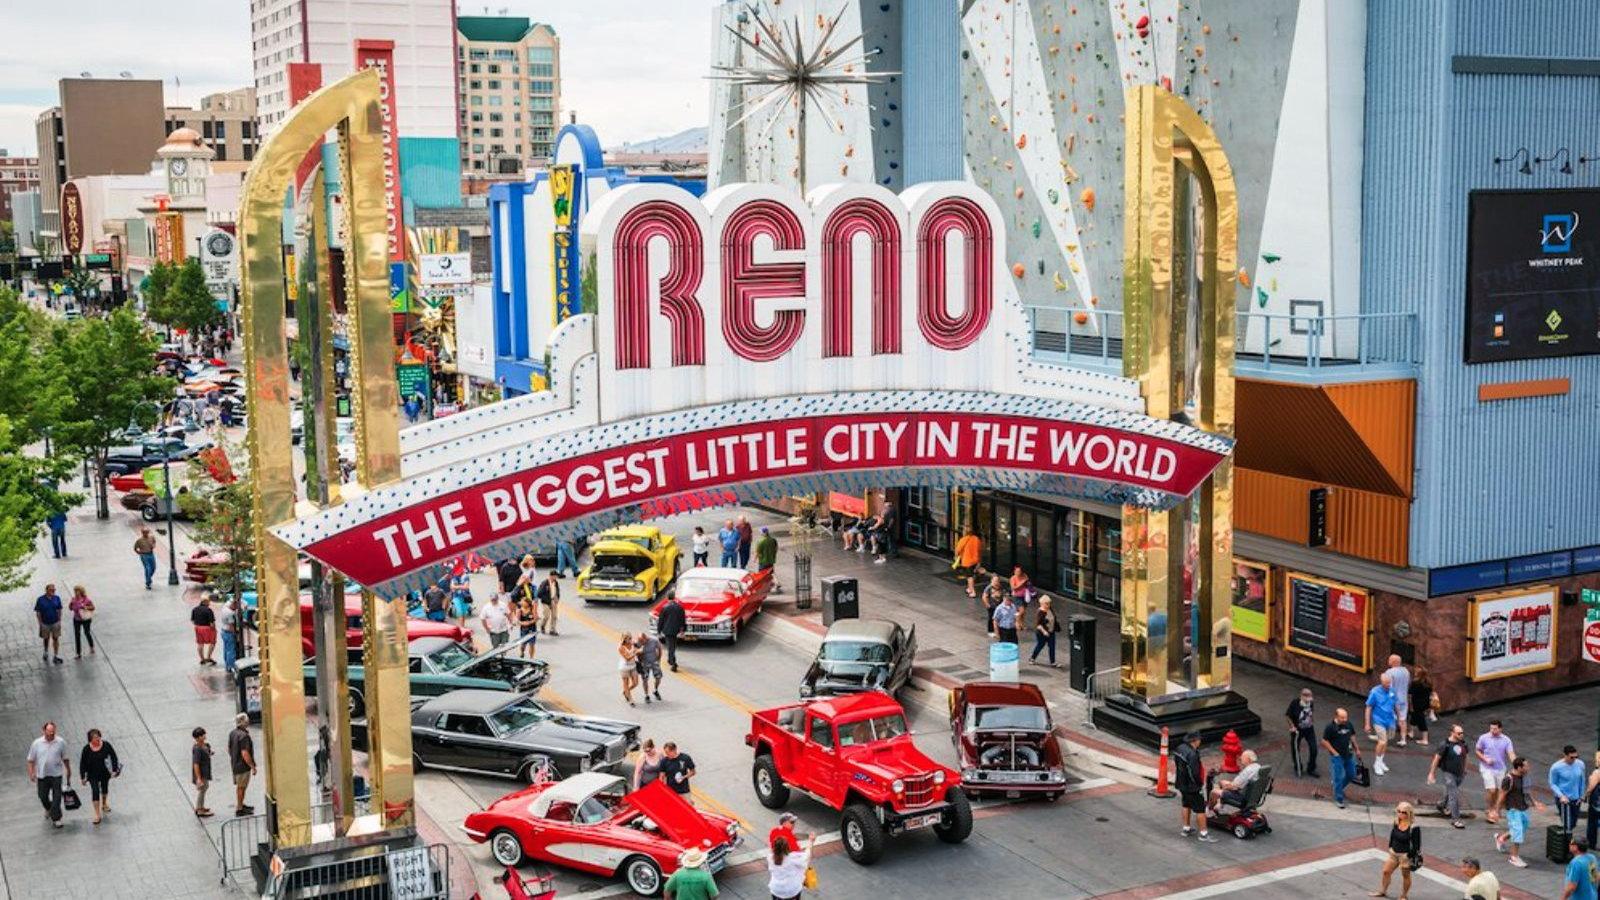 Hot August Nights, Reno NV, Corvette meet